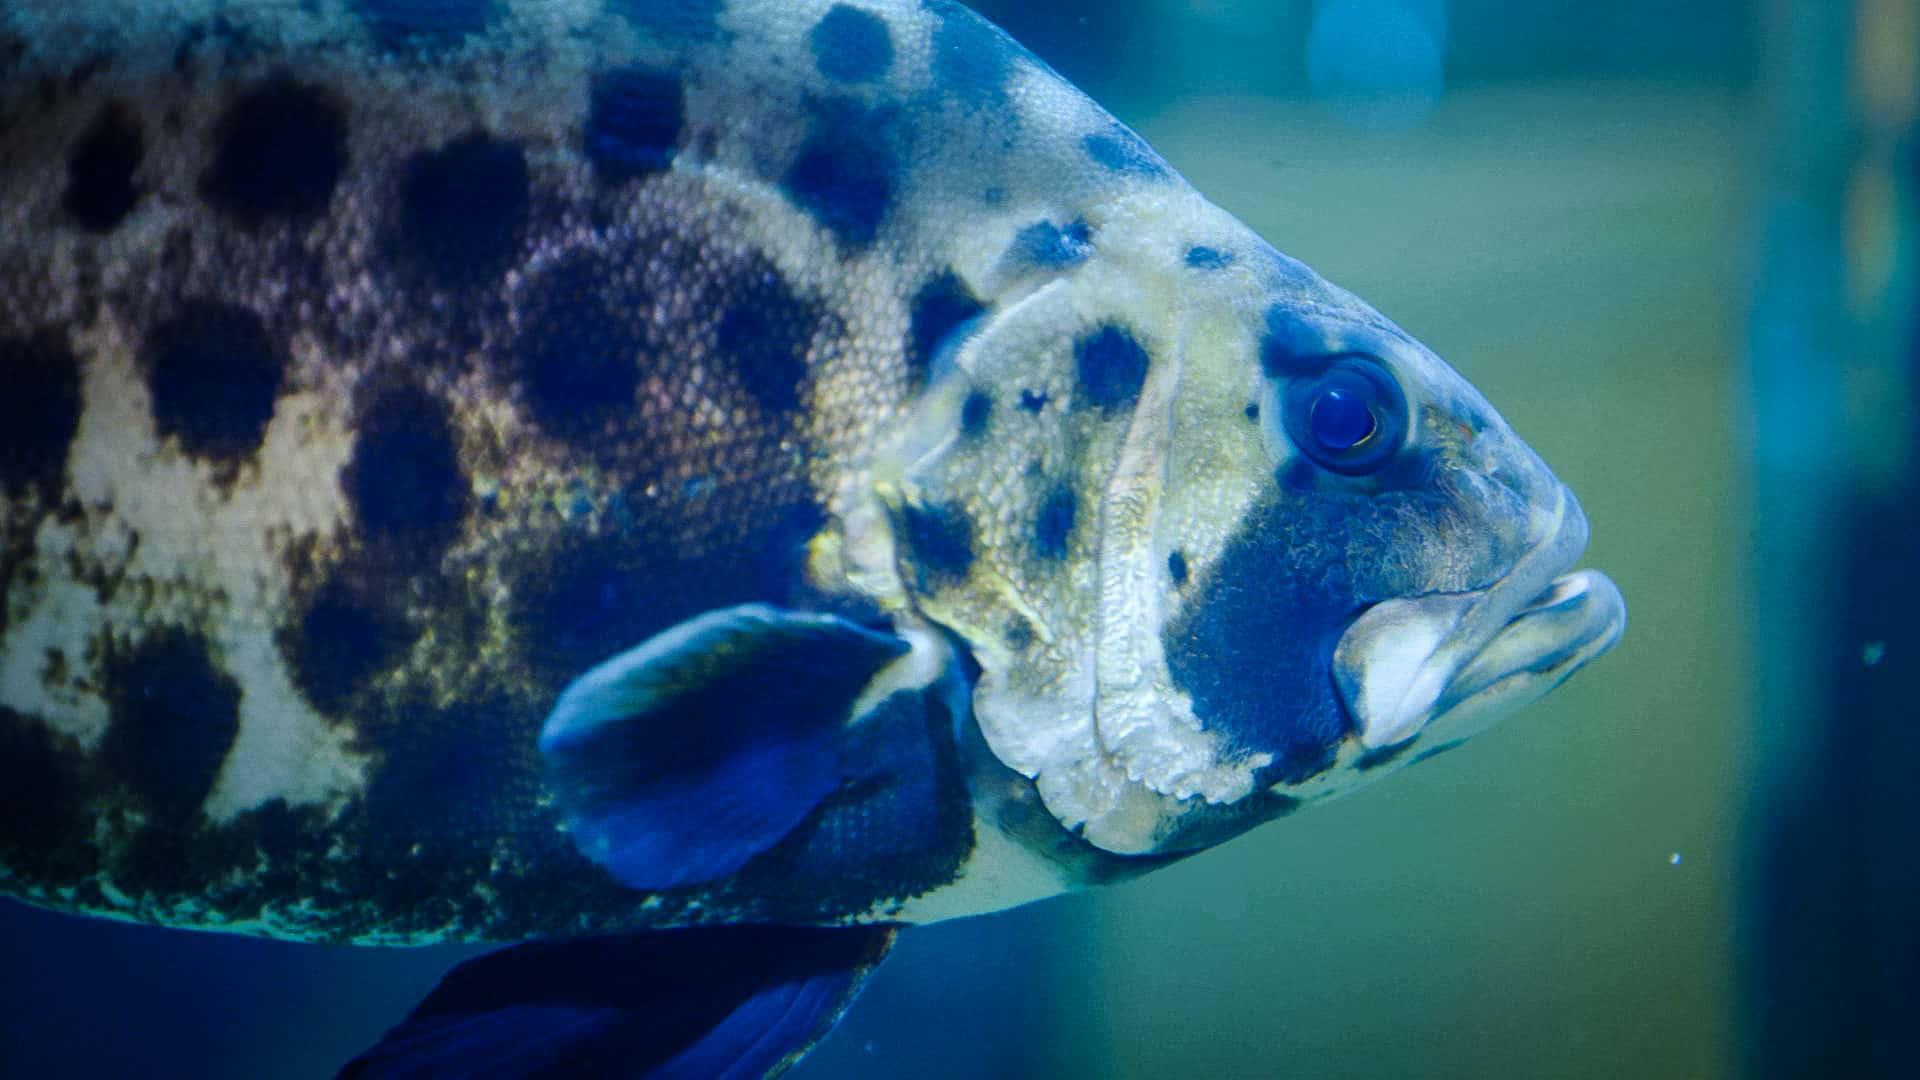 fish swimming through bag water quality